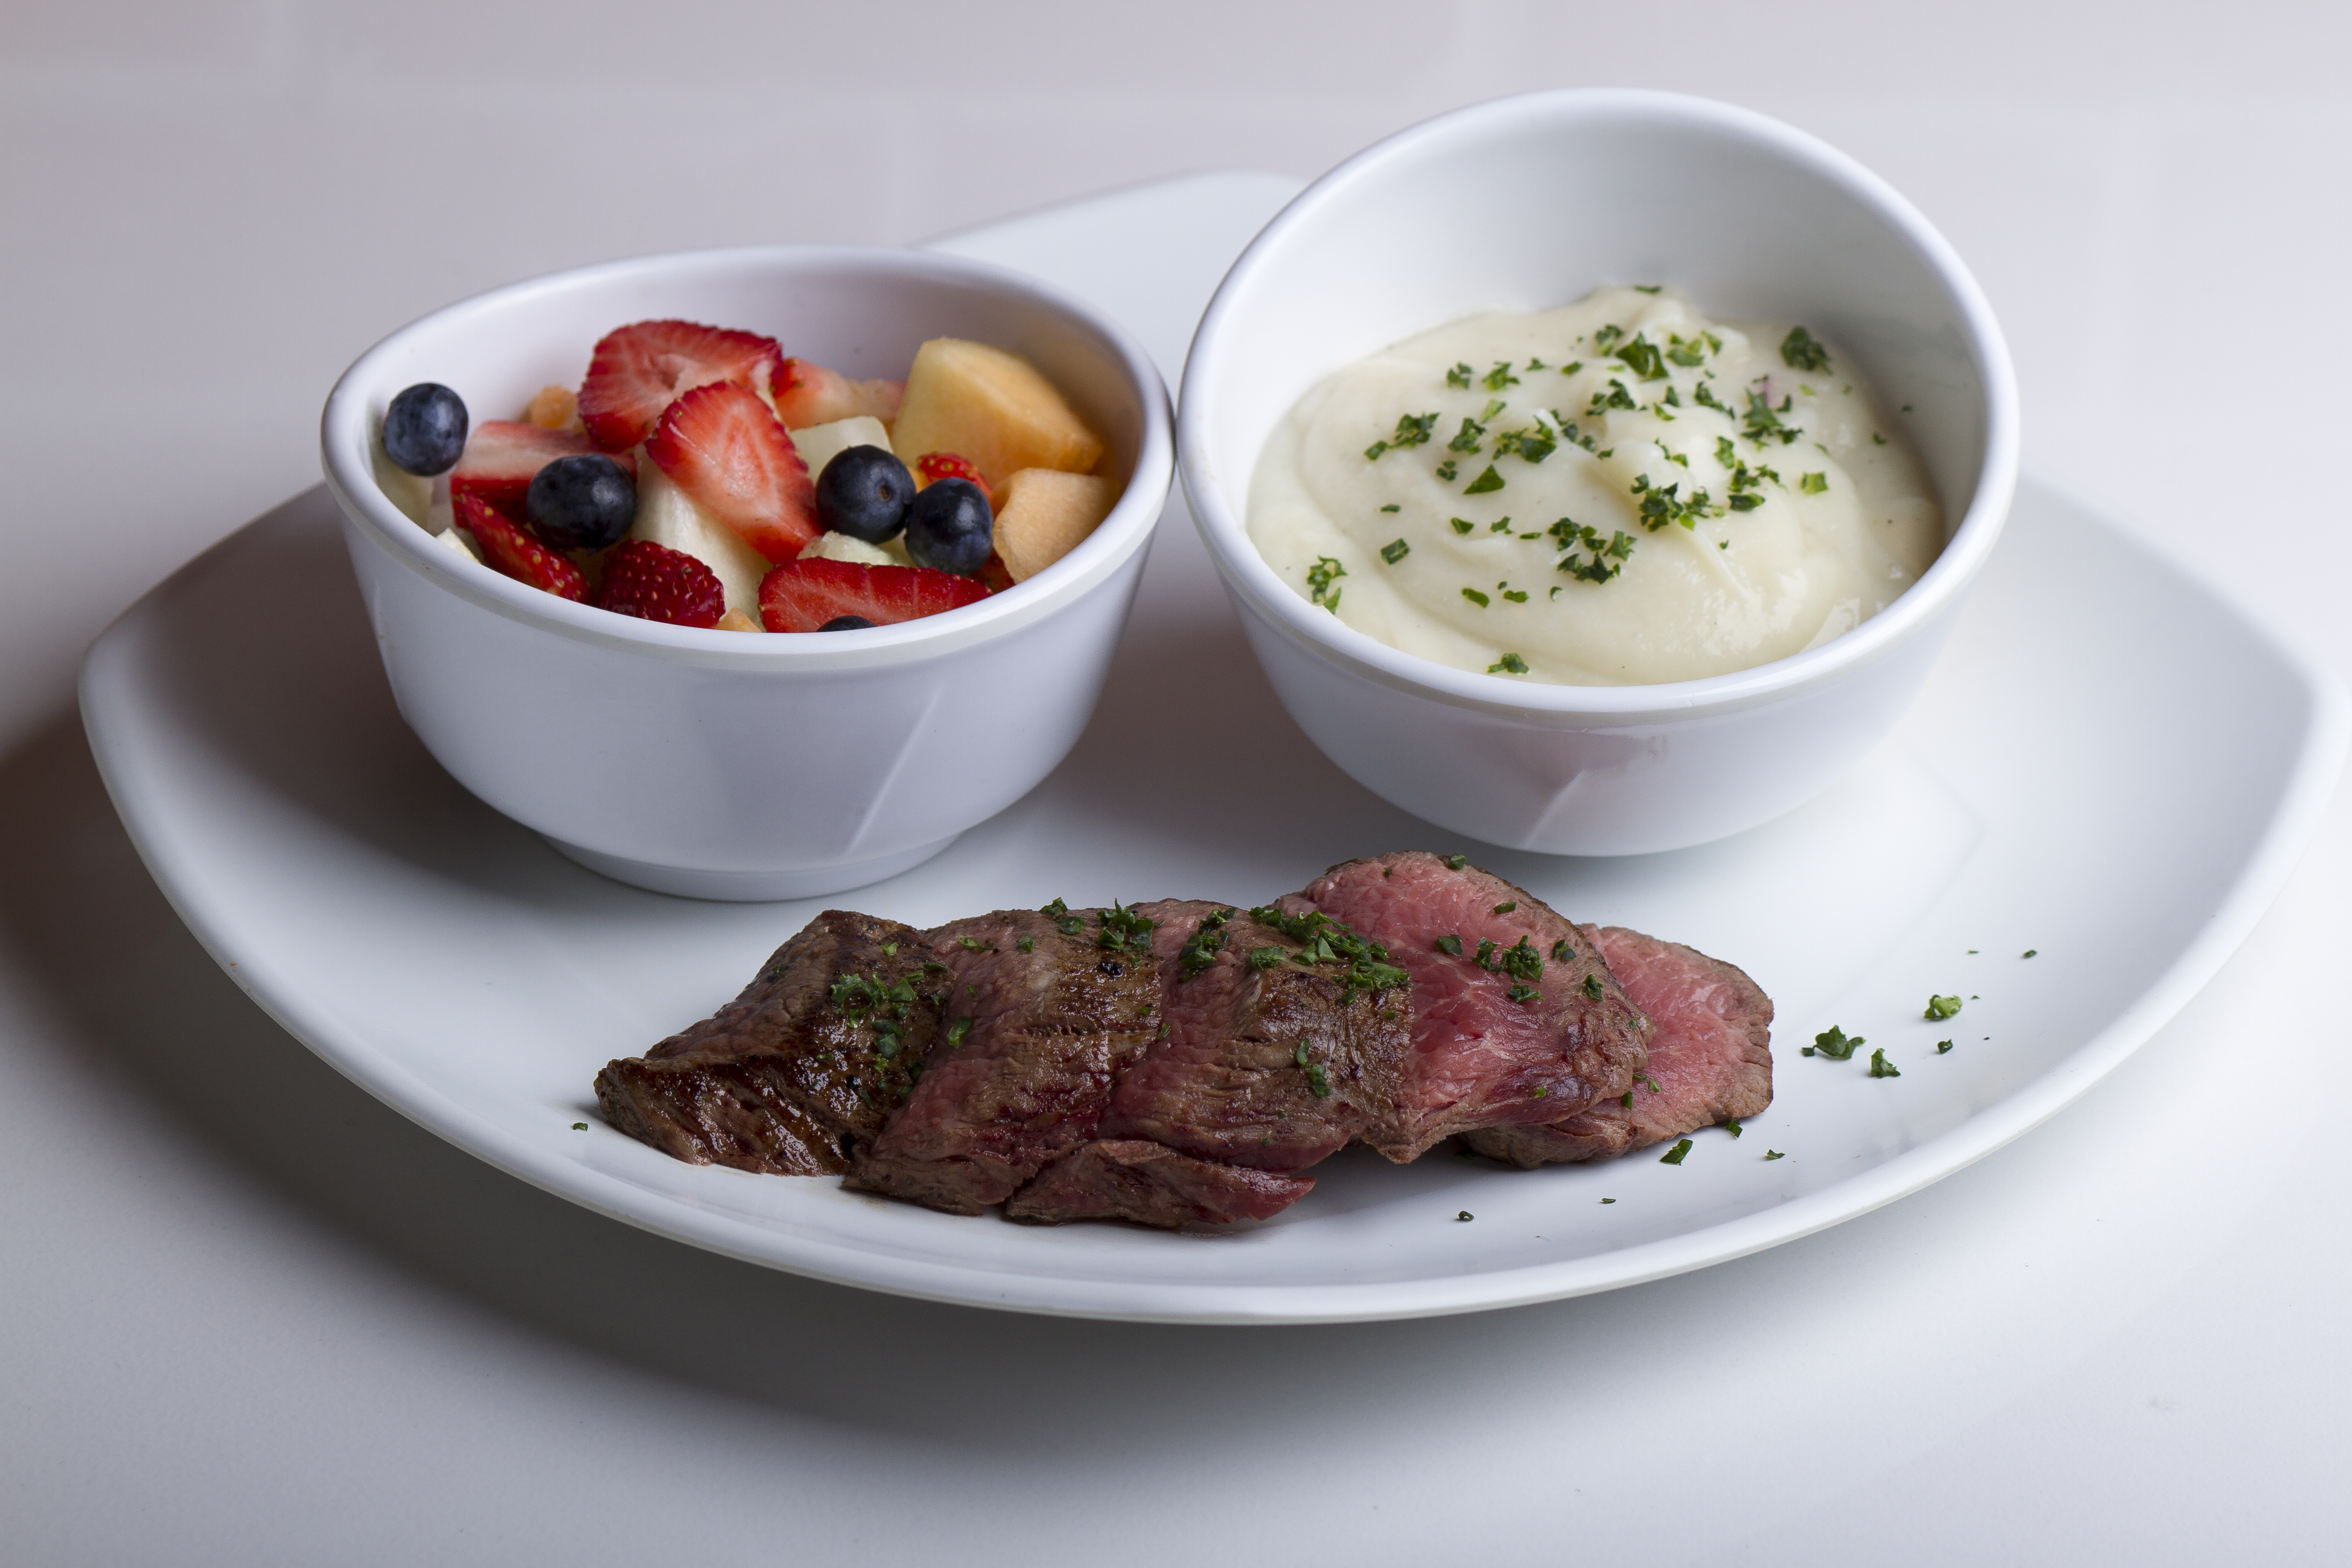 Tenderloin, Fruit Salad and Cauliflower Mash Build Your Own Meal